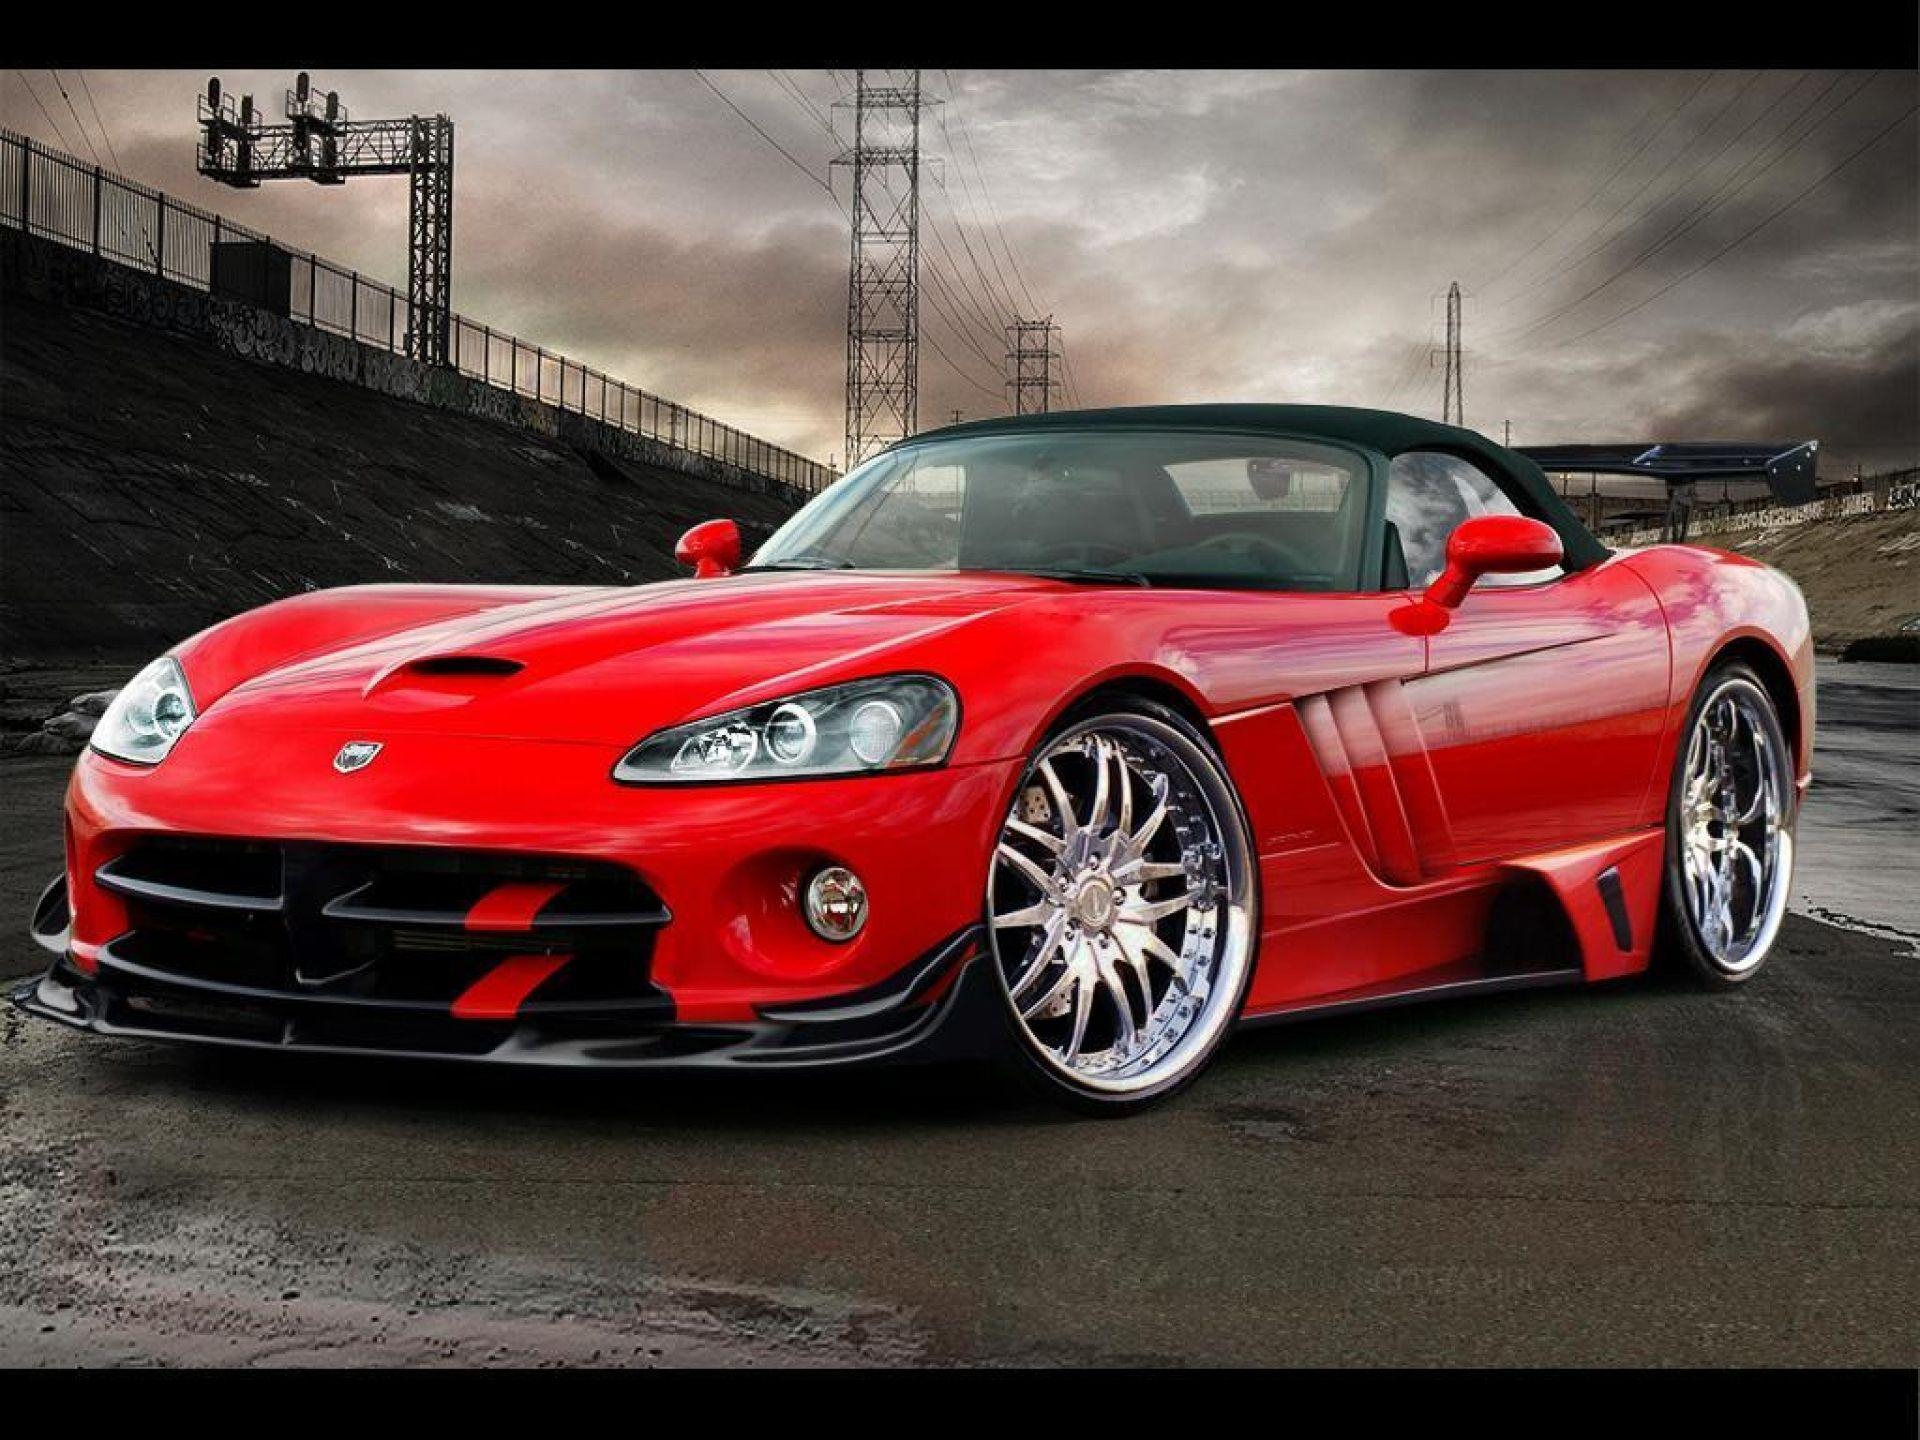 2936-dodge-viper-tuning-muscle-cars-wallpaper-16558706-fanpop ...